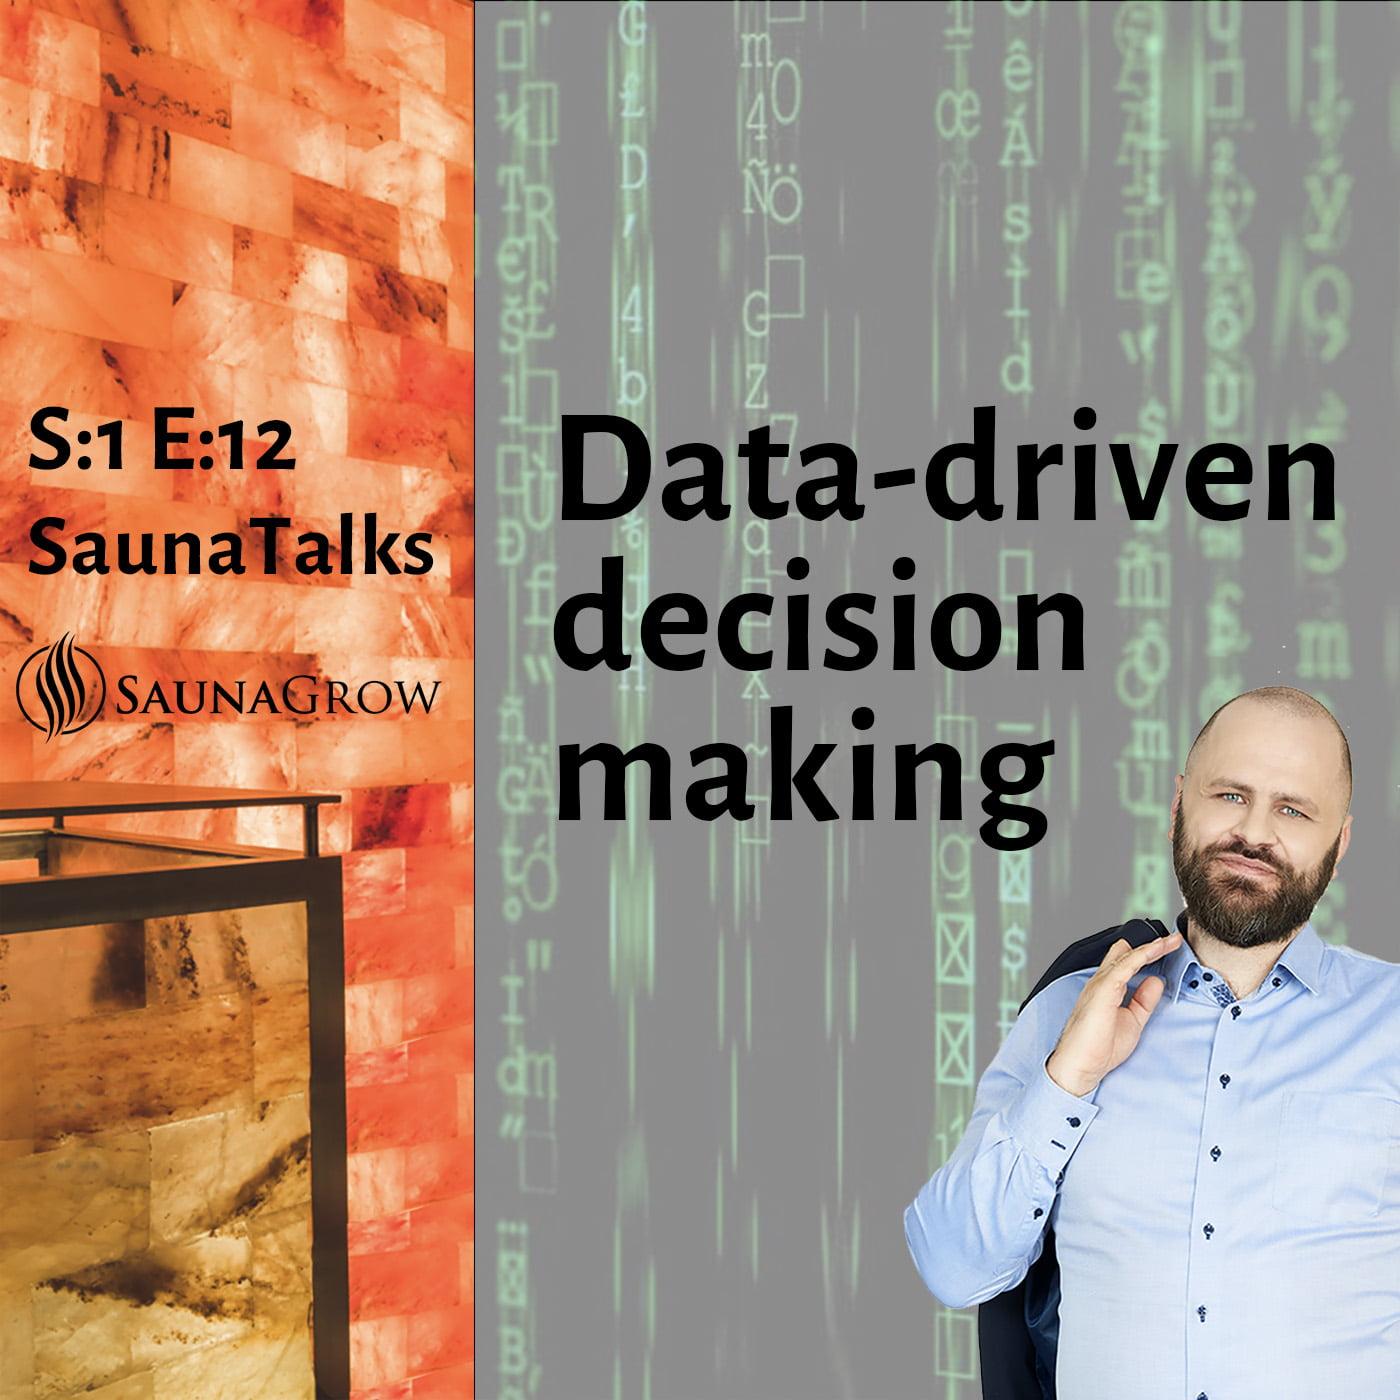 Data driven decision making